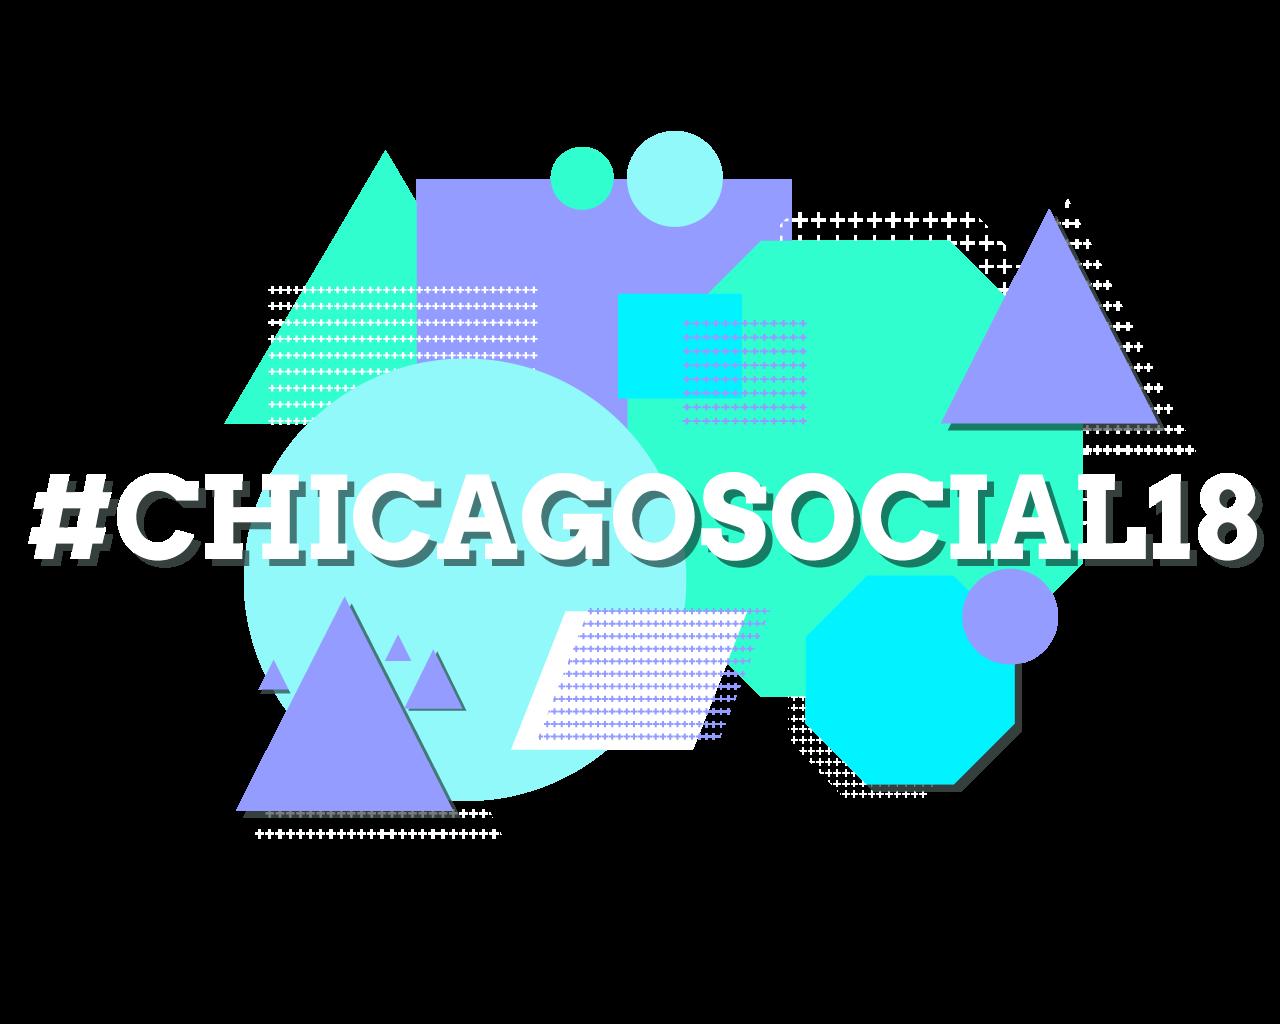 chicagosocial2018